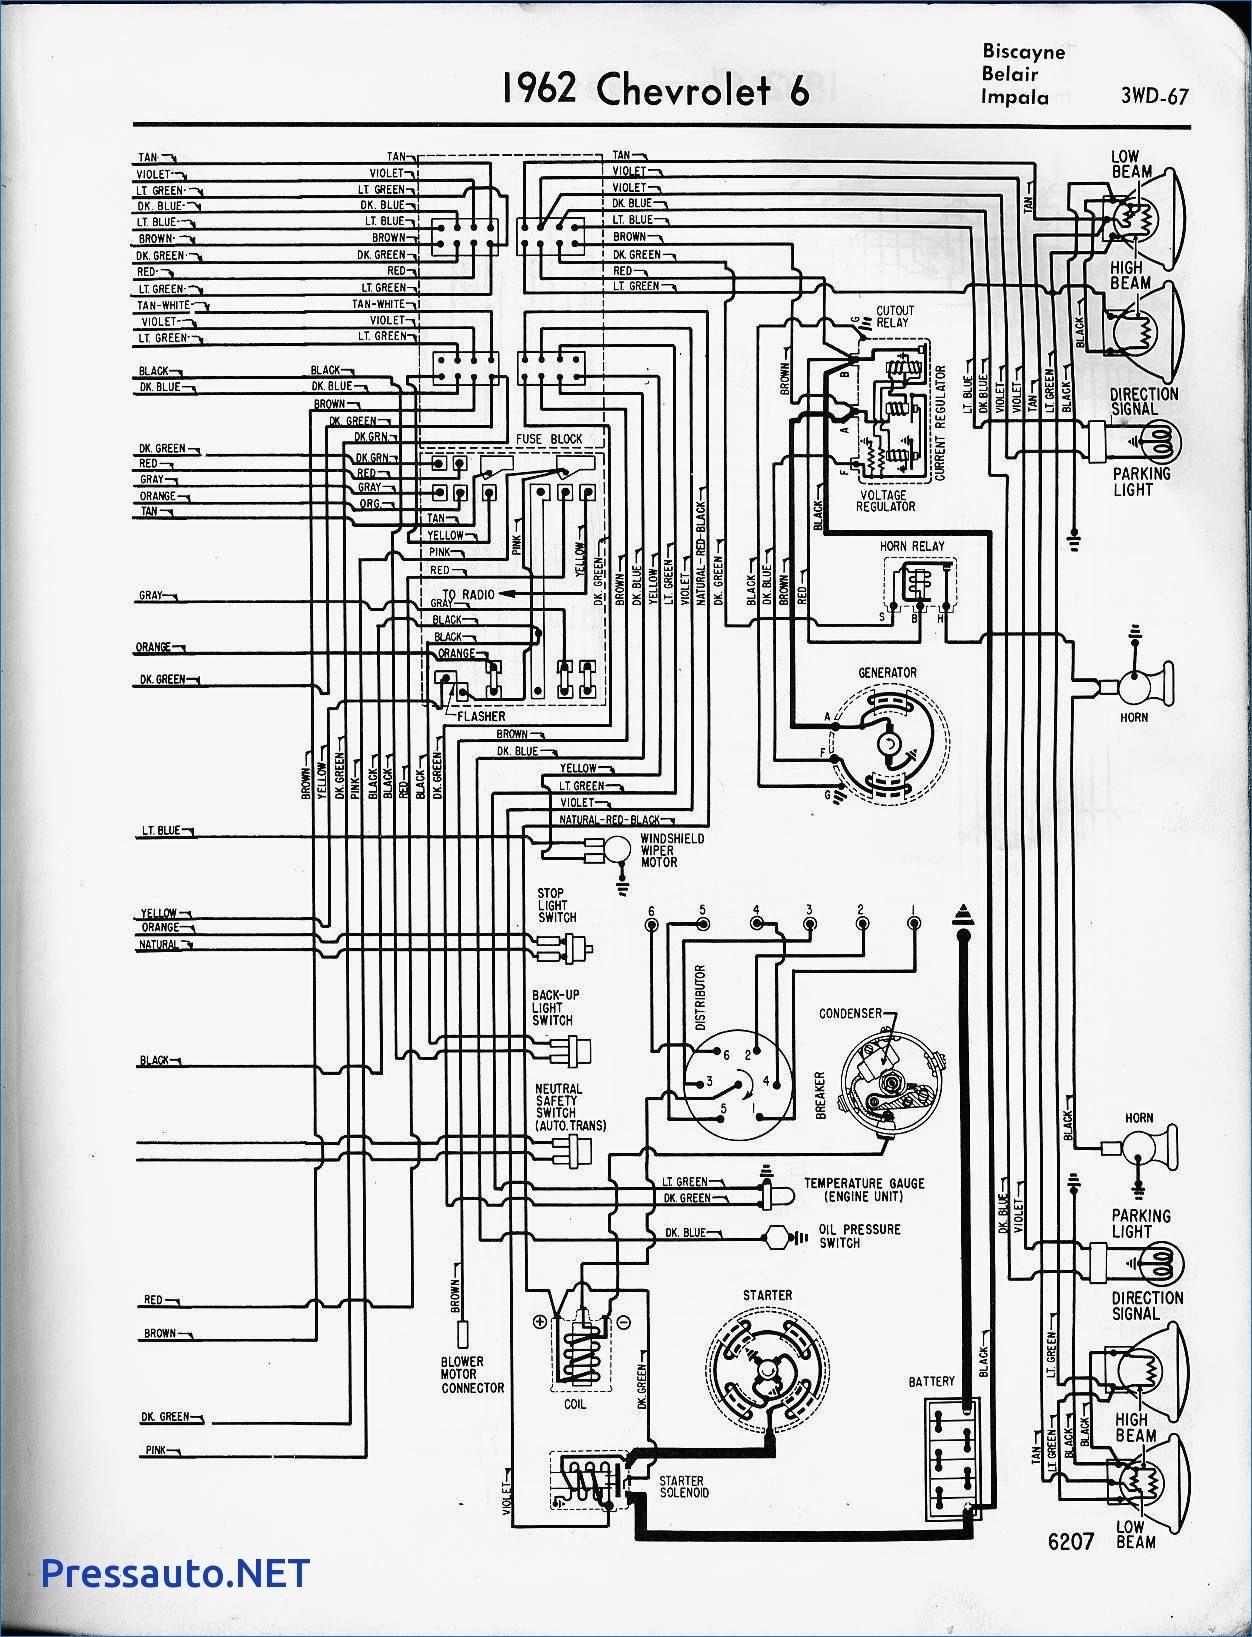 WN_8351] Wiring Diagram For 1961 Chevrolet V8 Biscayne Belair And Impala  Schematic WiringAnth Exxlu Wedab Vell Waro Hendil Mohammedshrine Librar Wiring 101